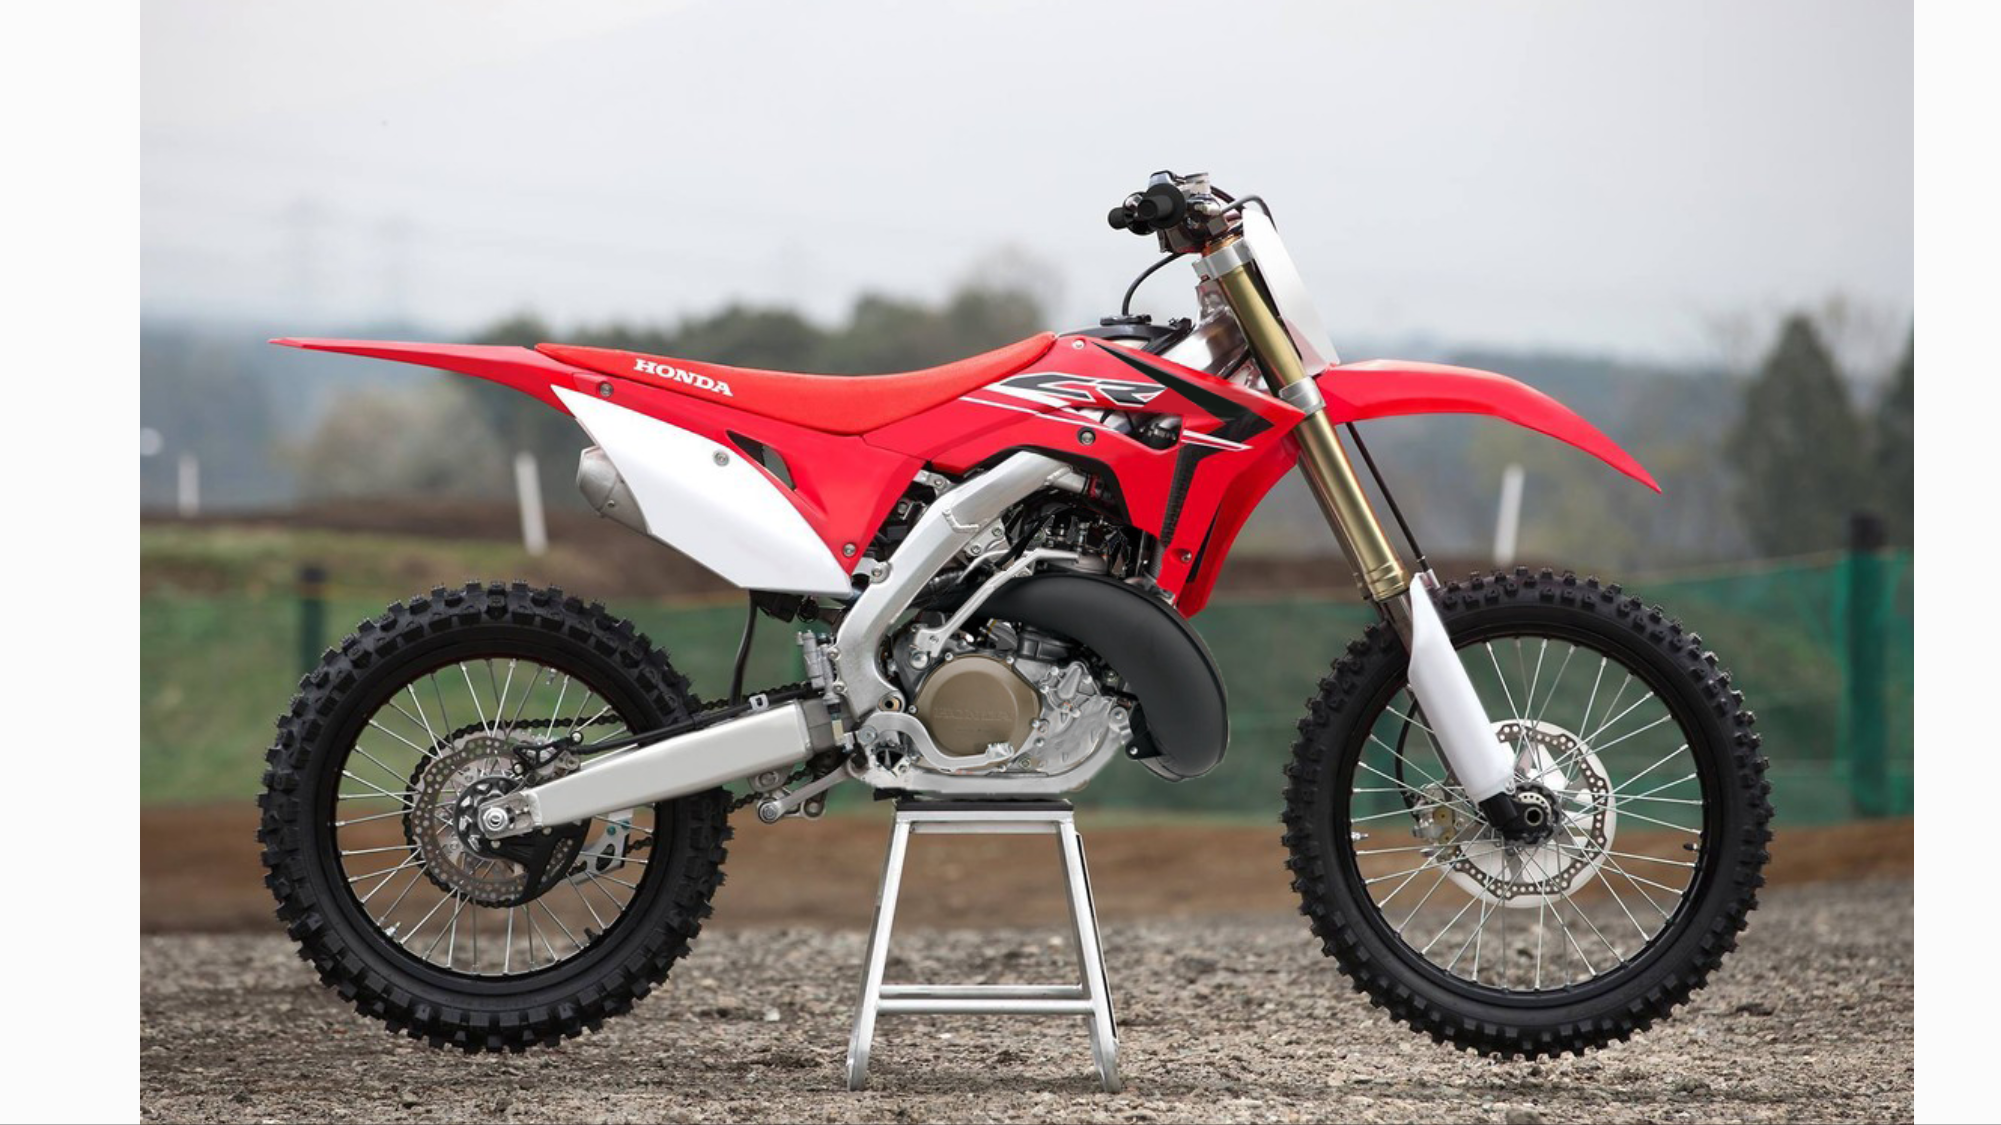 HONDA CRF-450R FACTORY | Wish list | Pinterest | Honda, Motocross ...